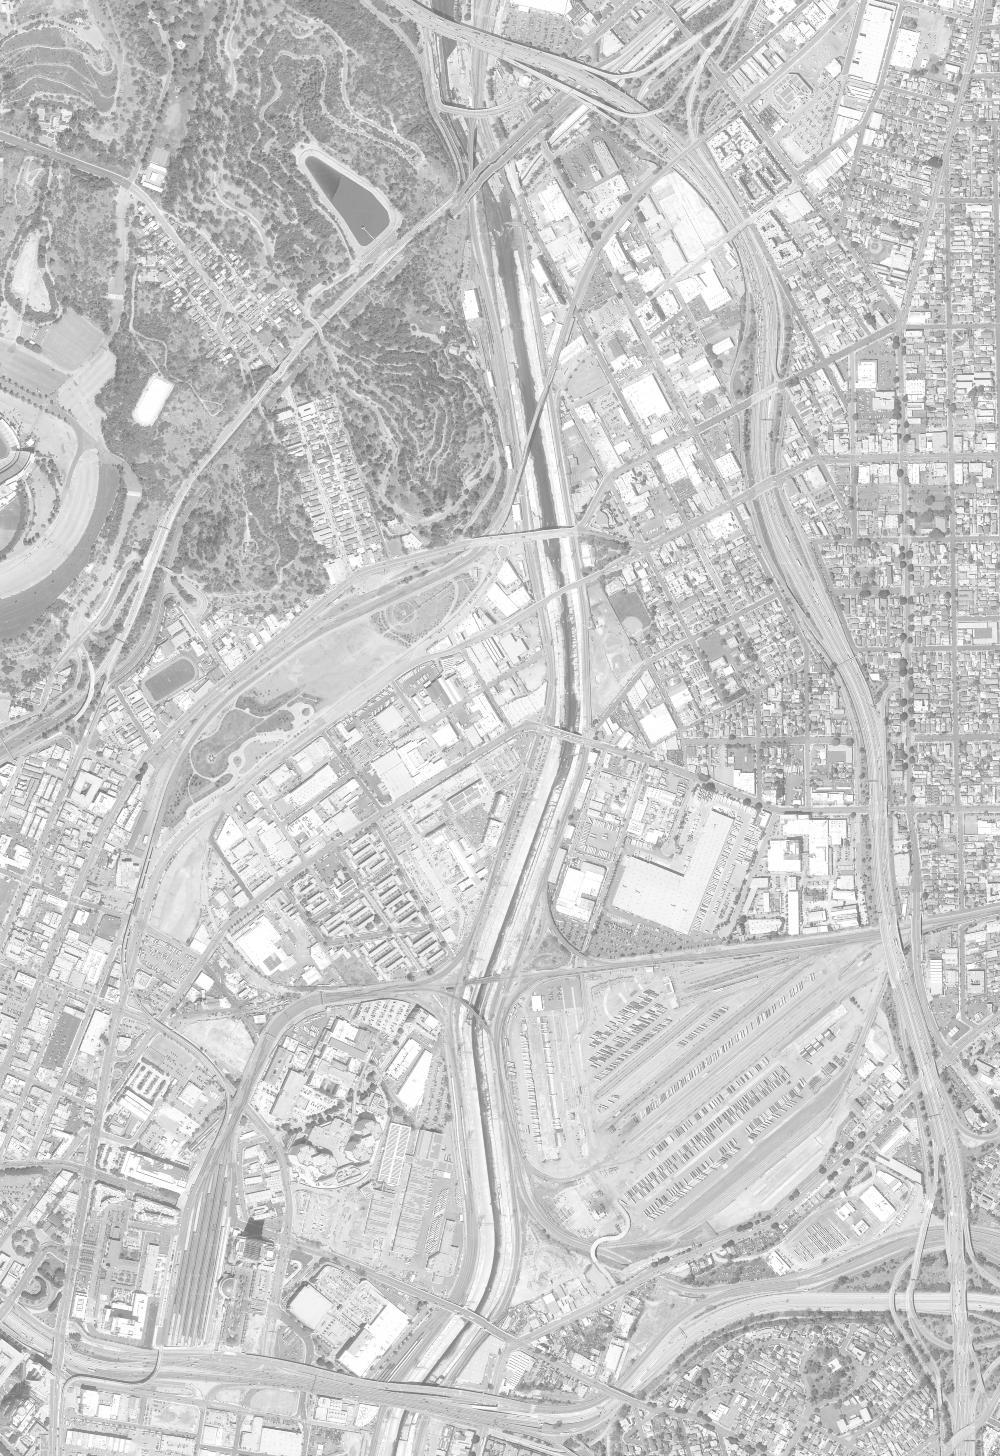 Delta Sketch on Map Final.jpg